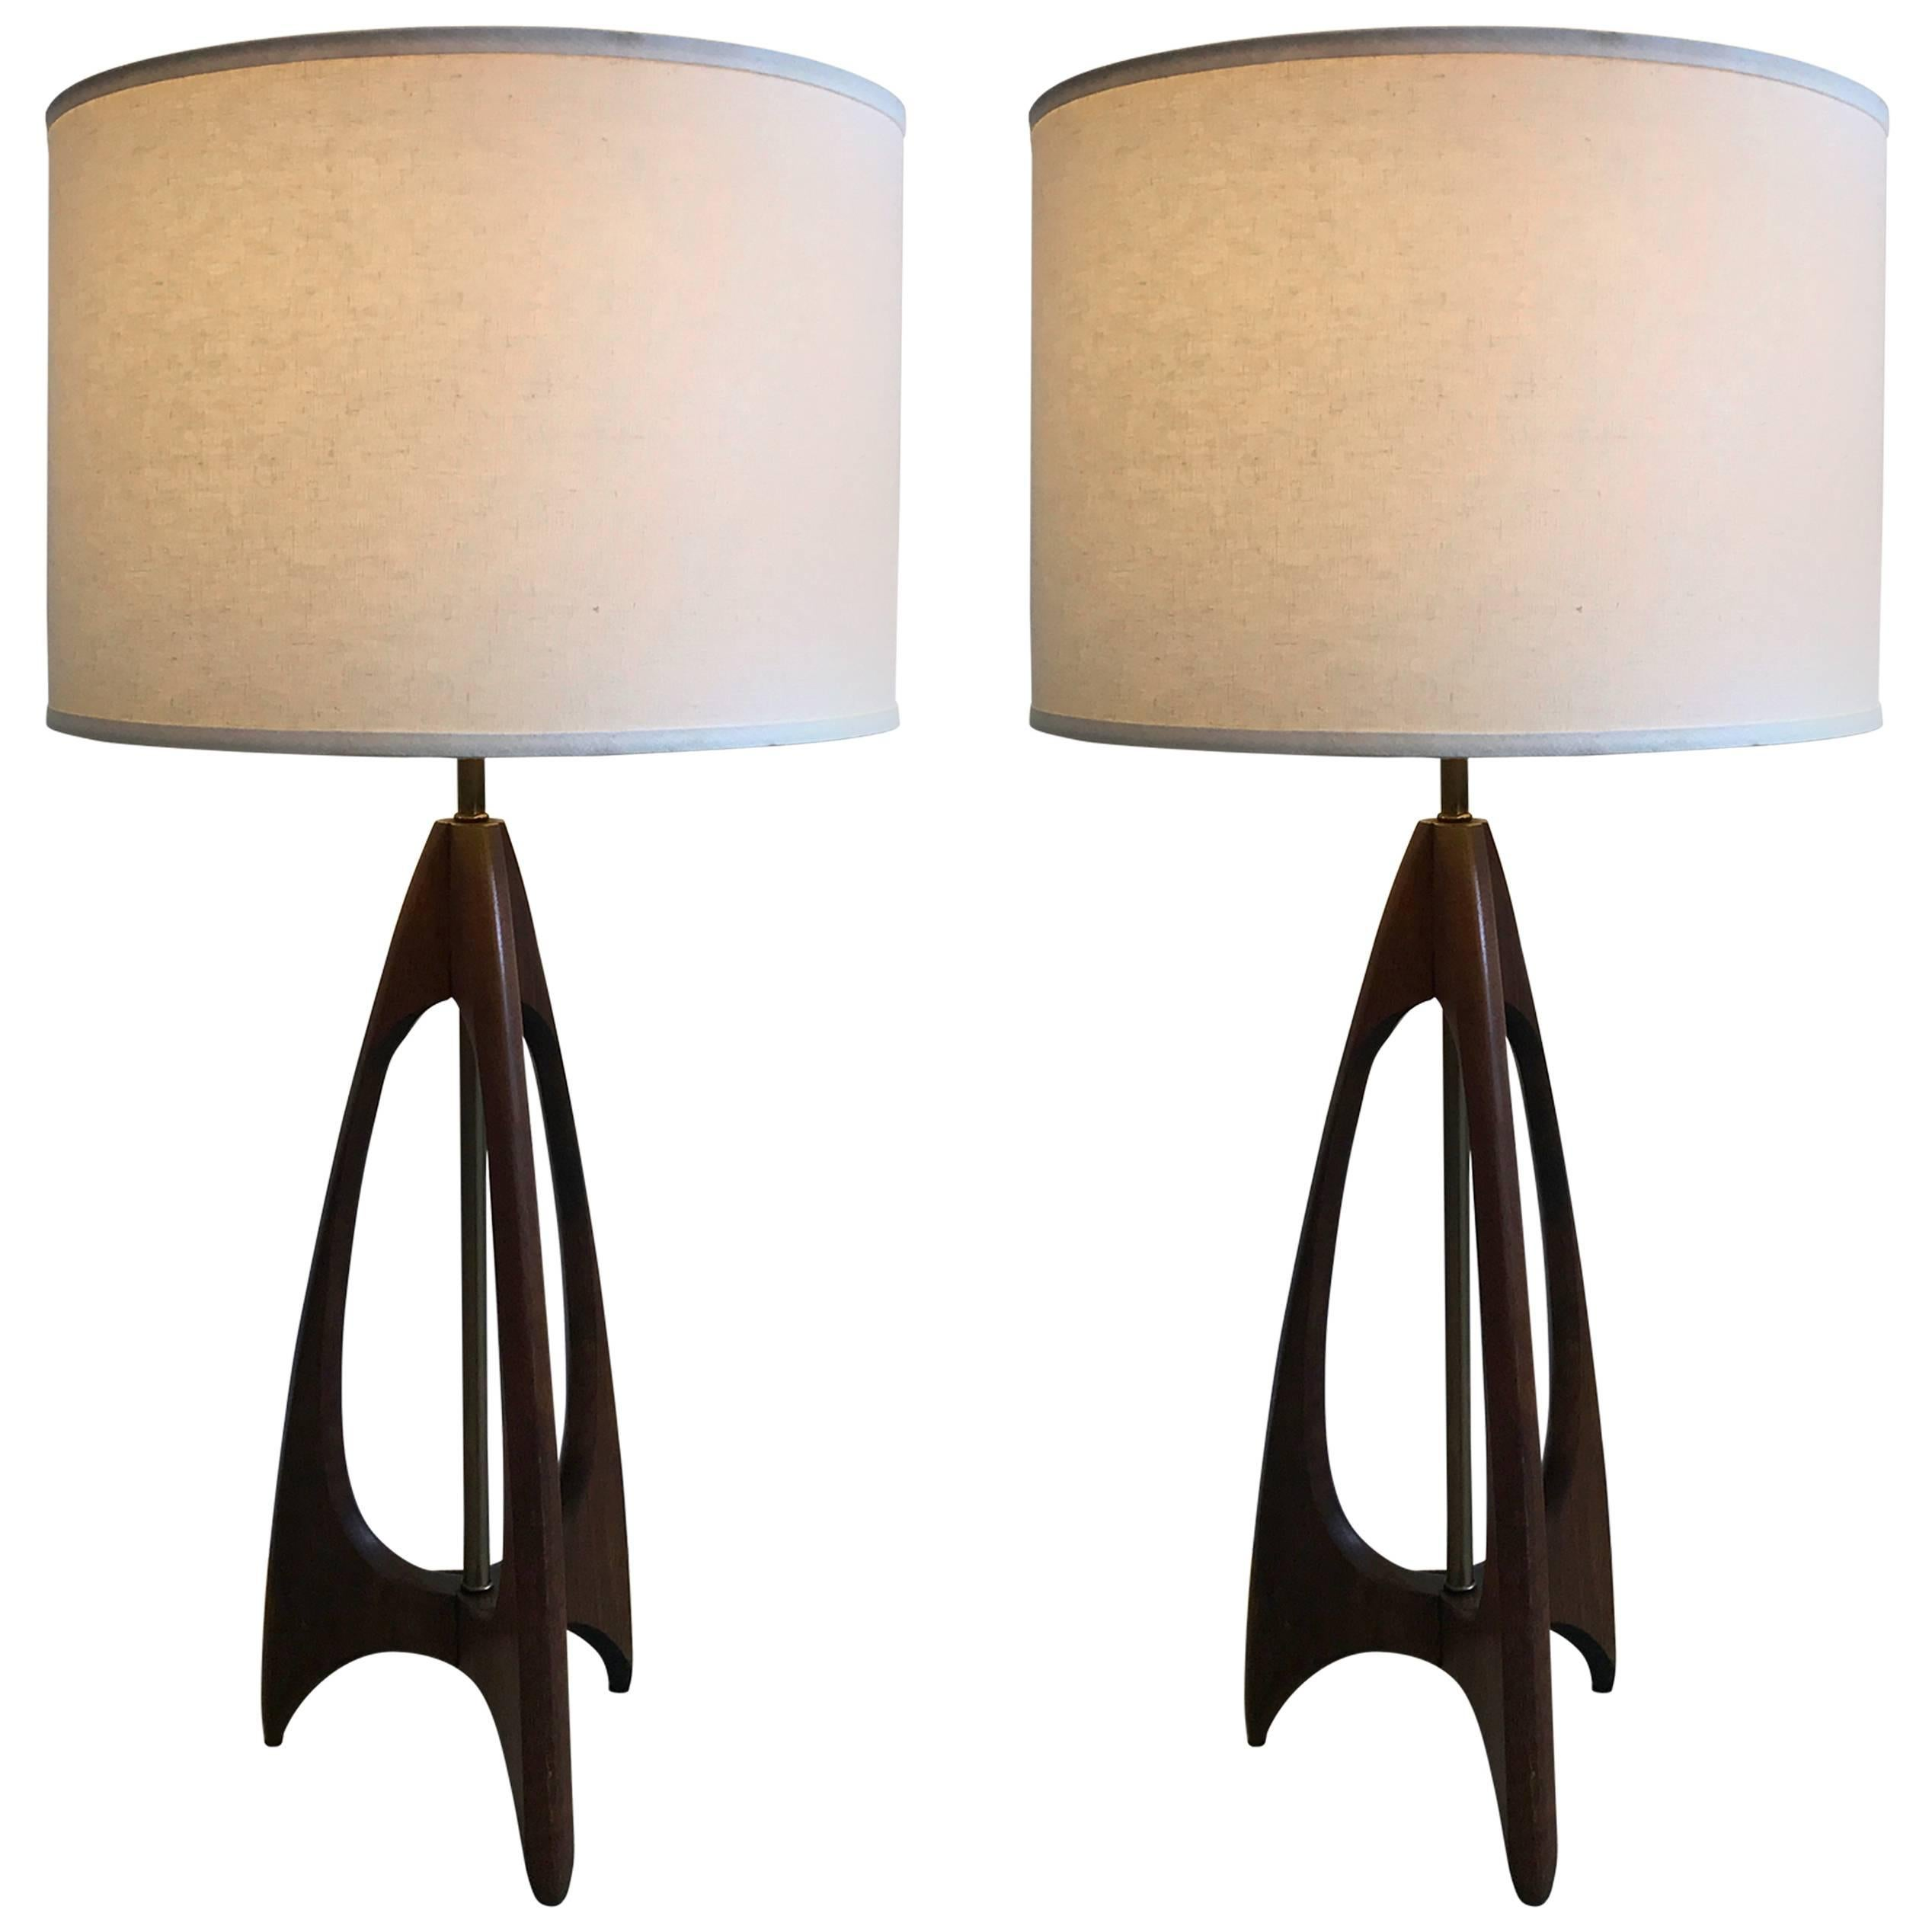 Pair Of Teak And Brass Tripod Table Lamps, Mid Century Modern, Denmark,